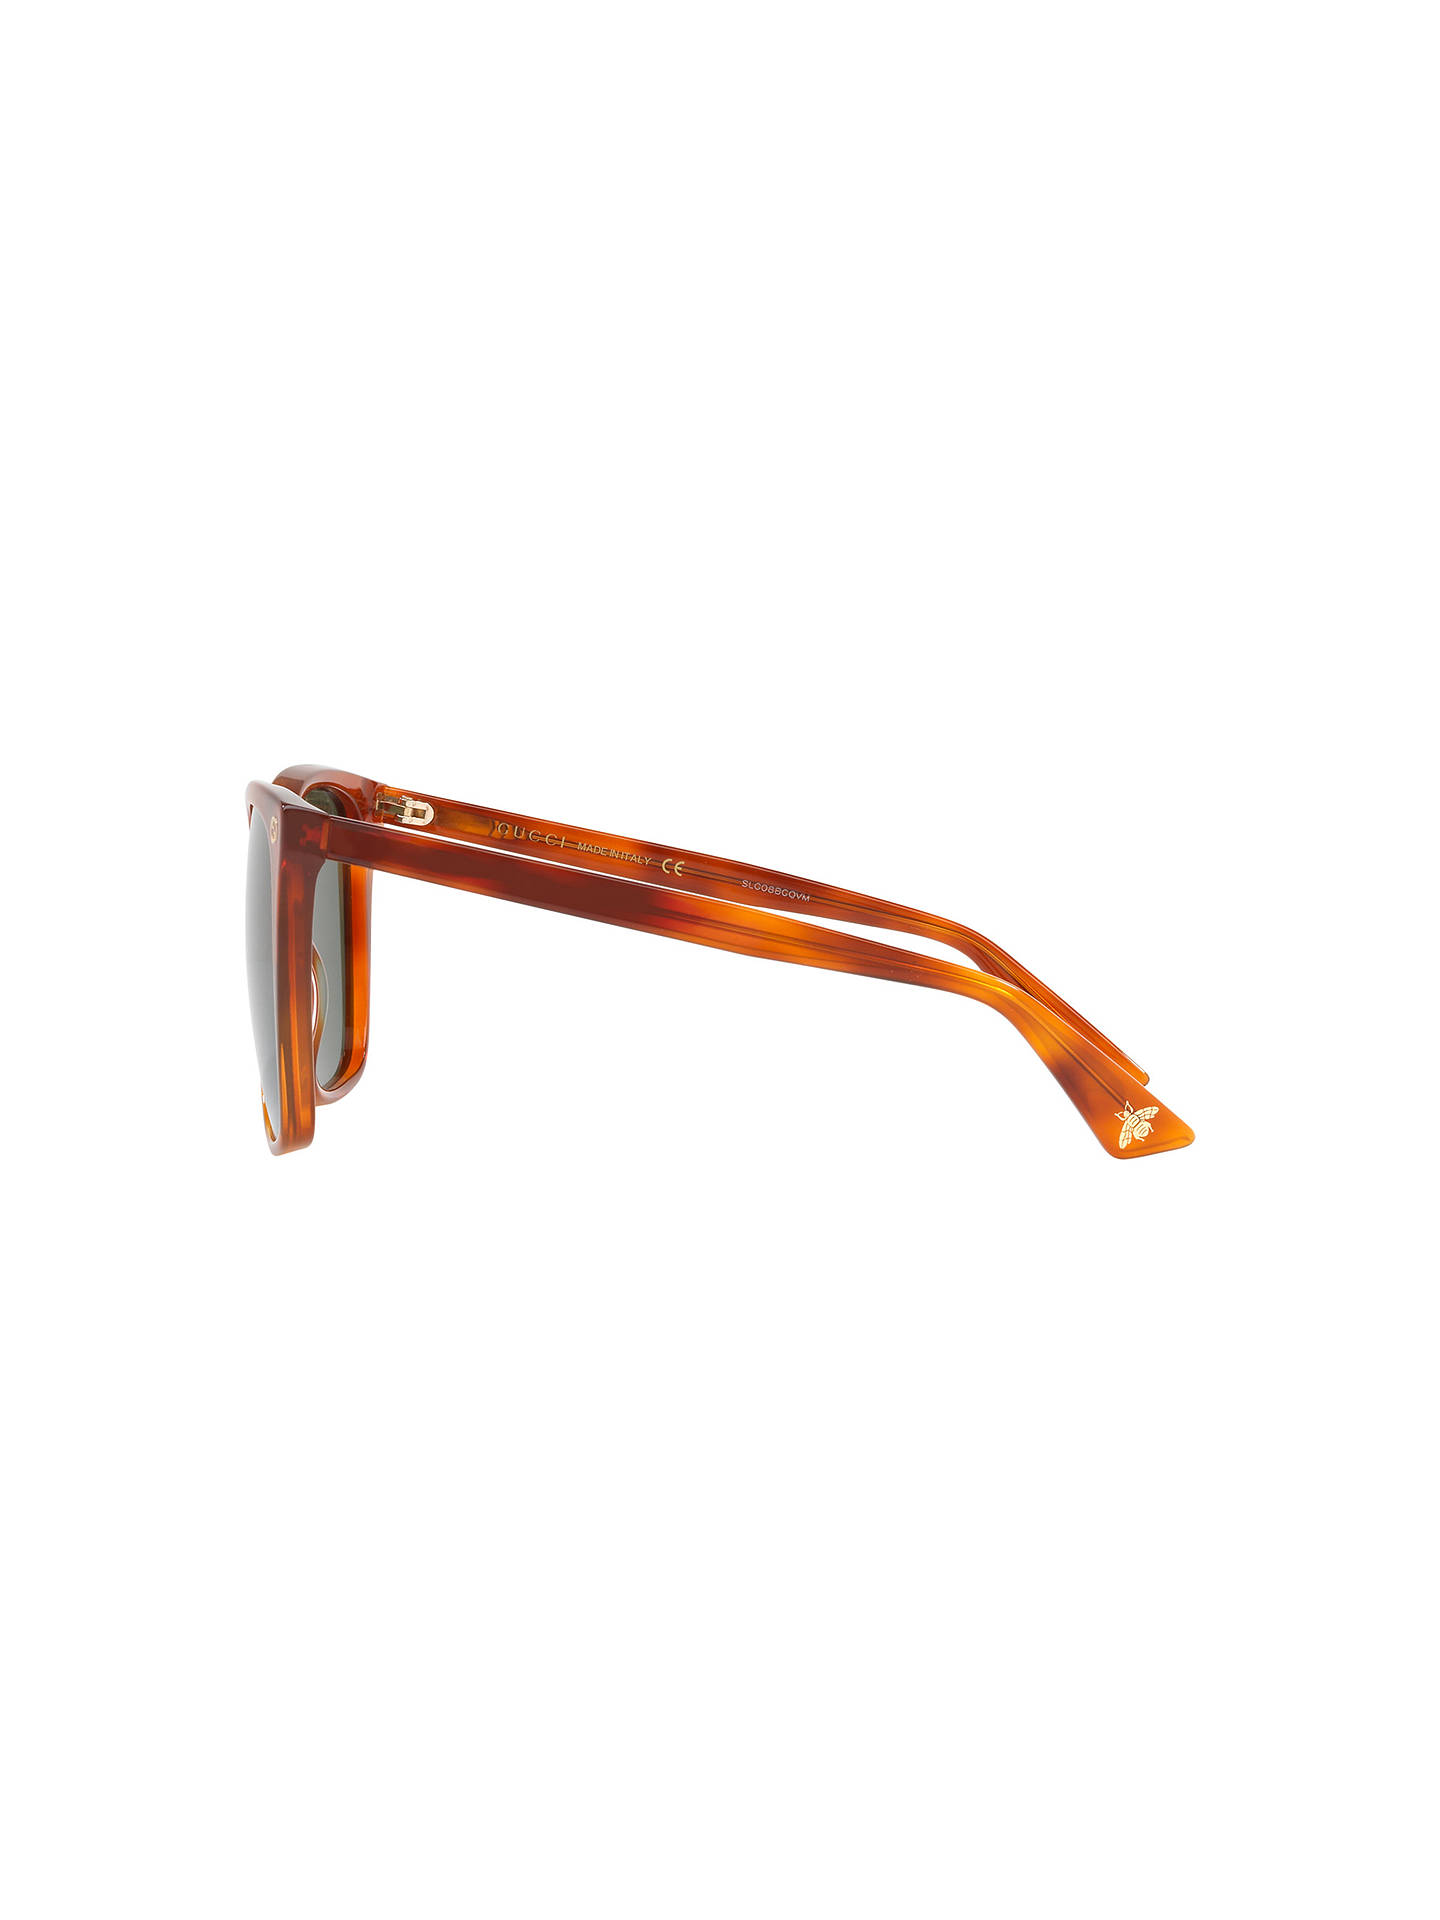 37361329fba Gucci GG0022S Square Sunglasses at John Lewis   Partners